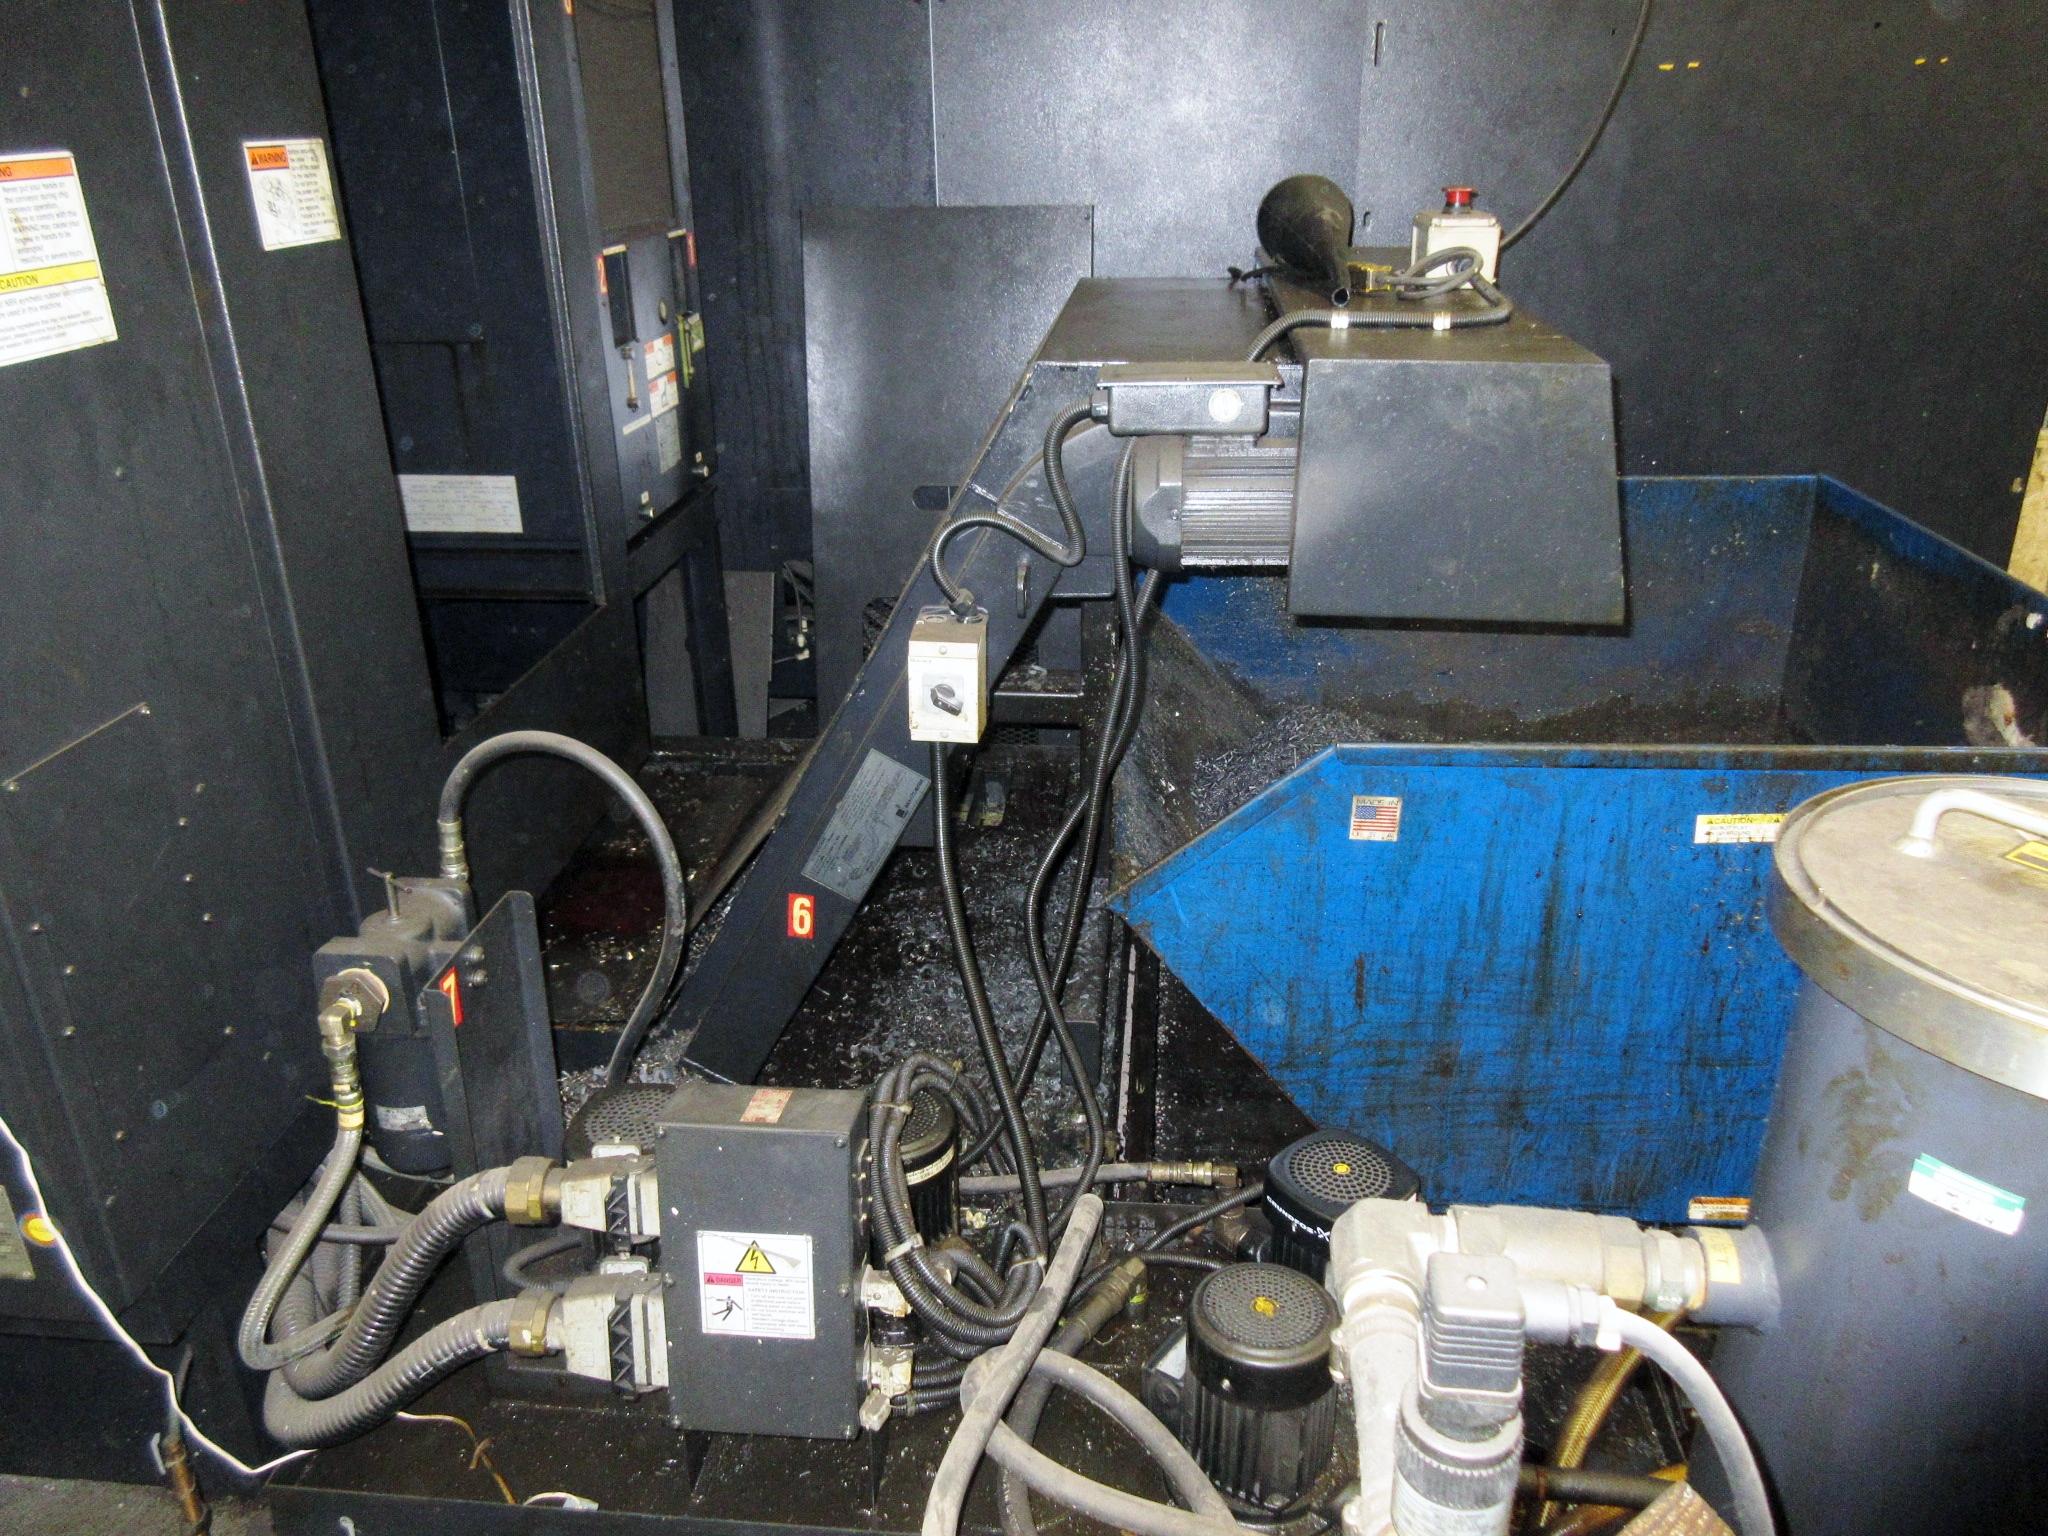 Mazak HCN-6000-II CNC Horizontal Machining Center With Palletech System - Image 19 of 22